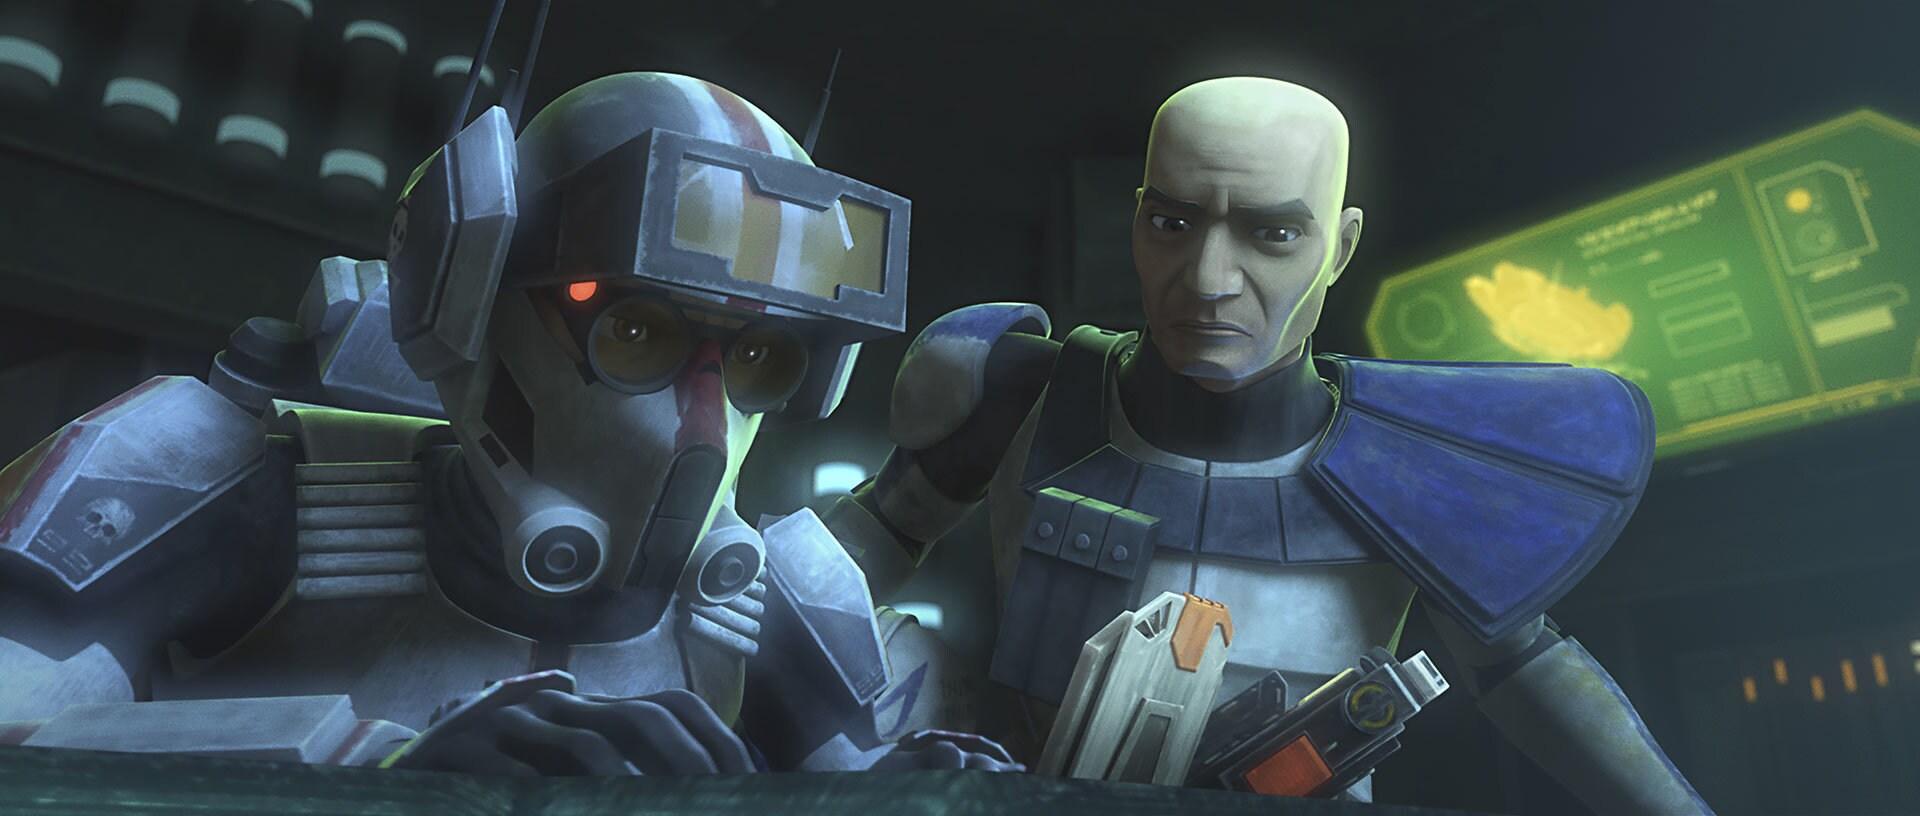 Tech and Clone Captain Rex